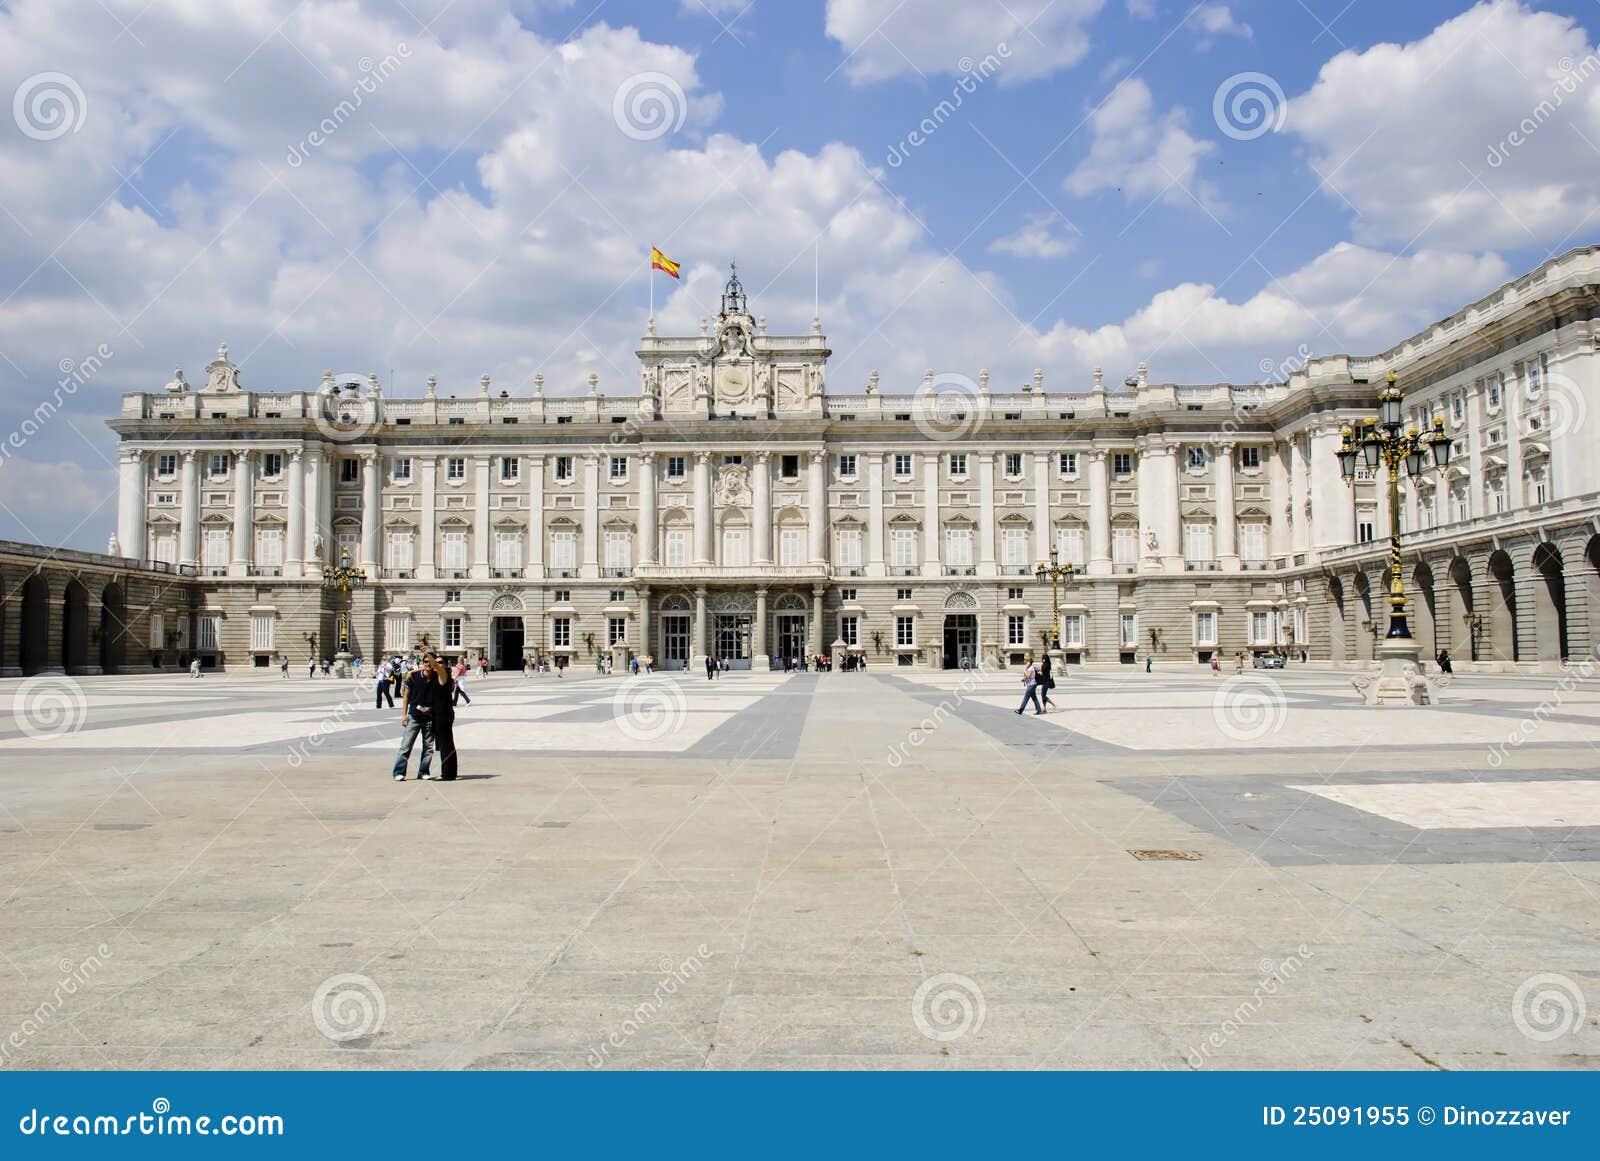 Royal palace, Madrid